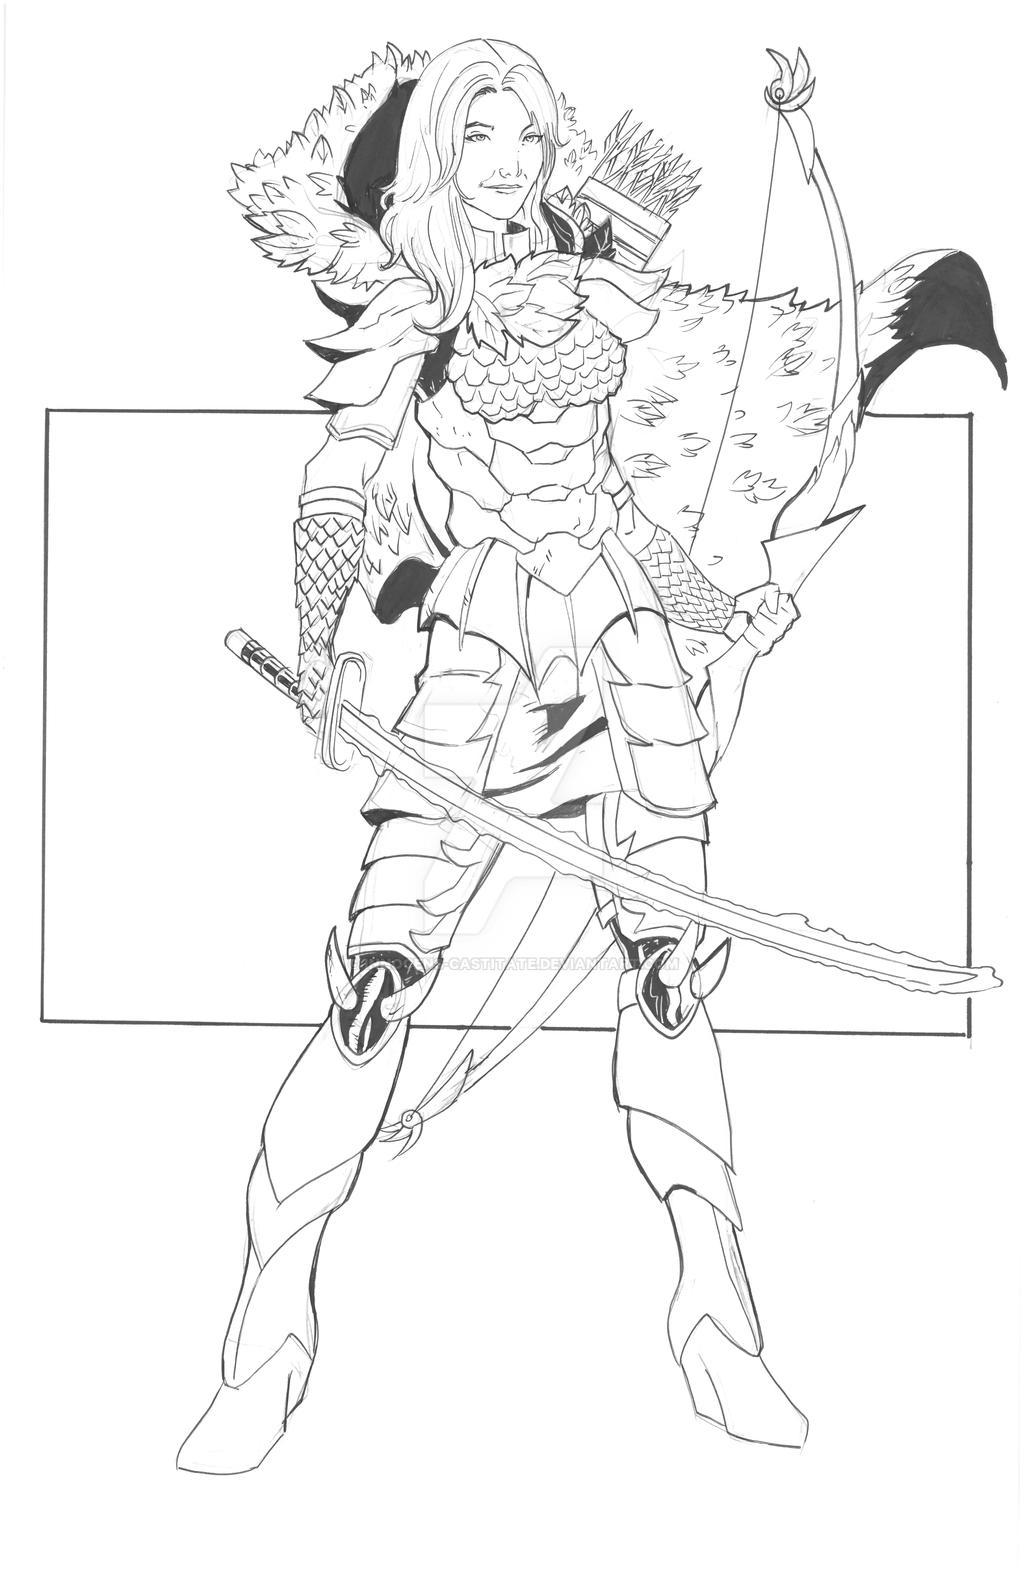 Character Designs: Nicola The Ranger